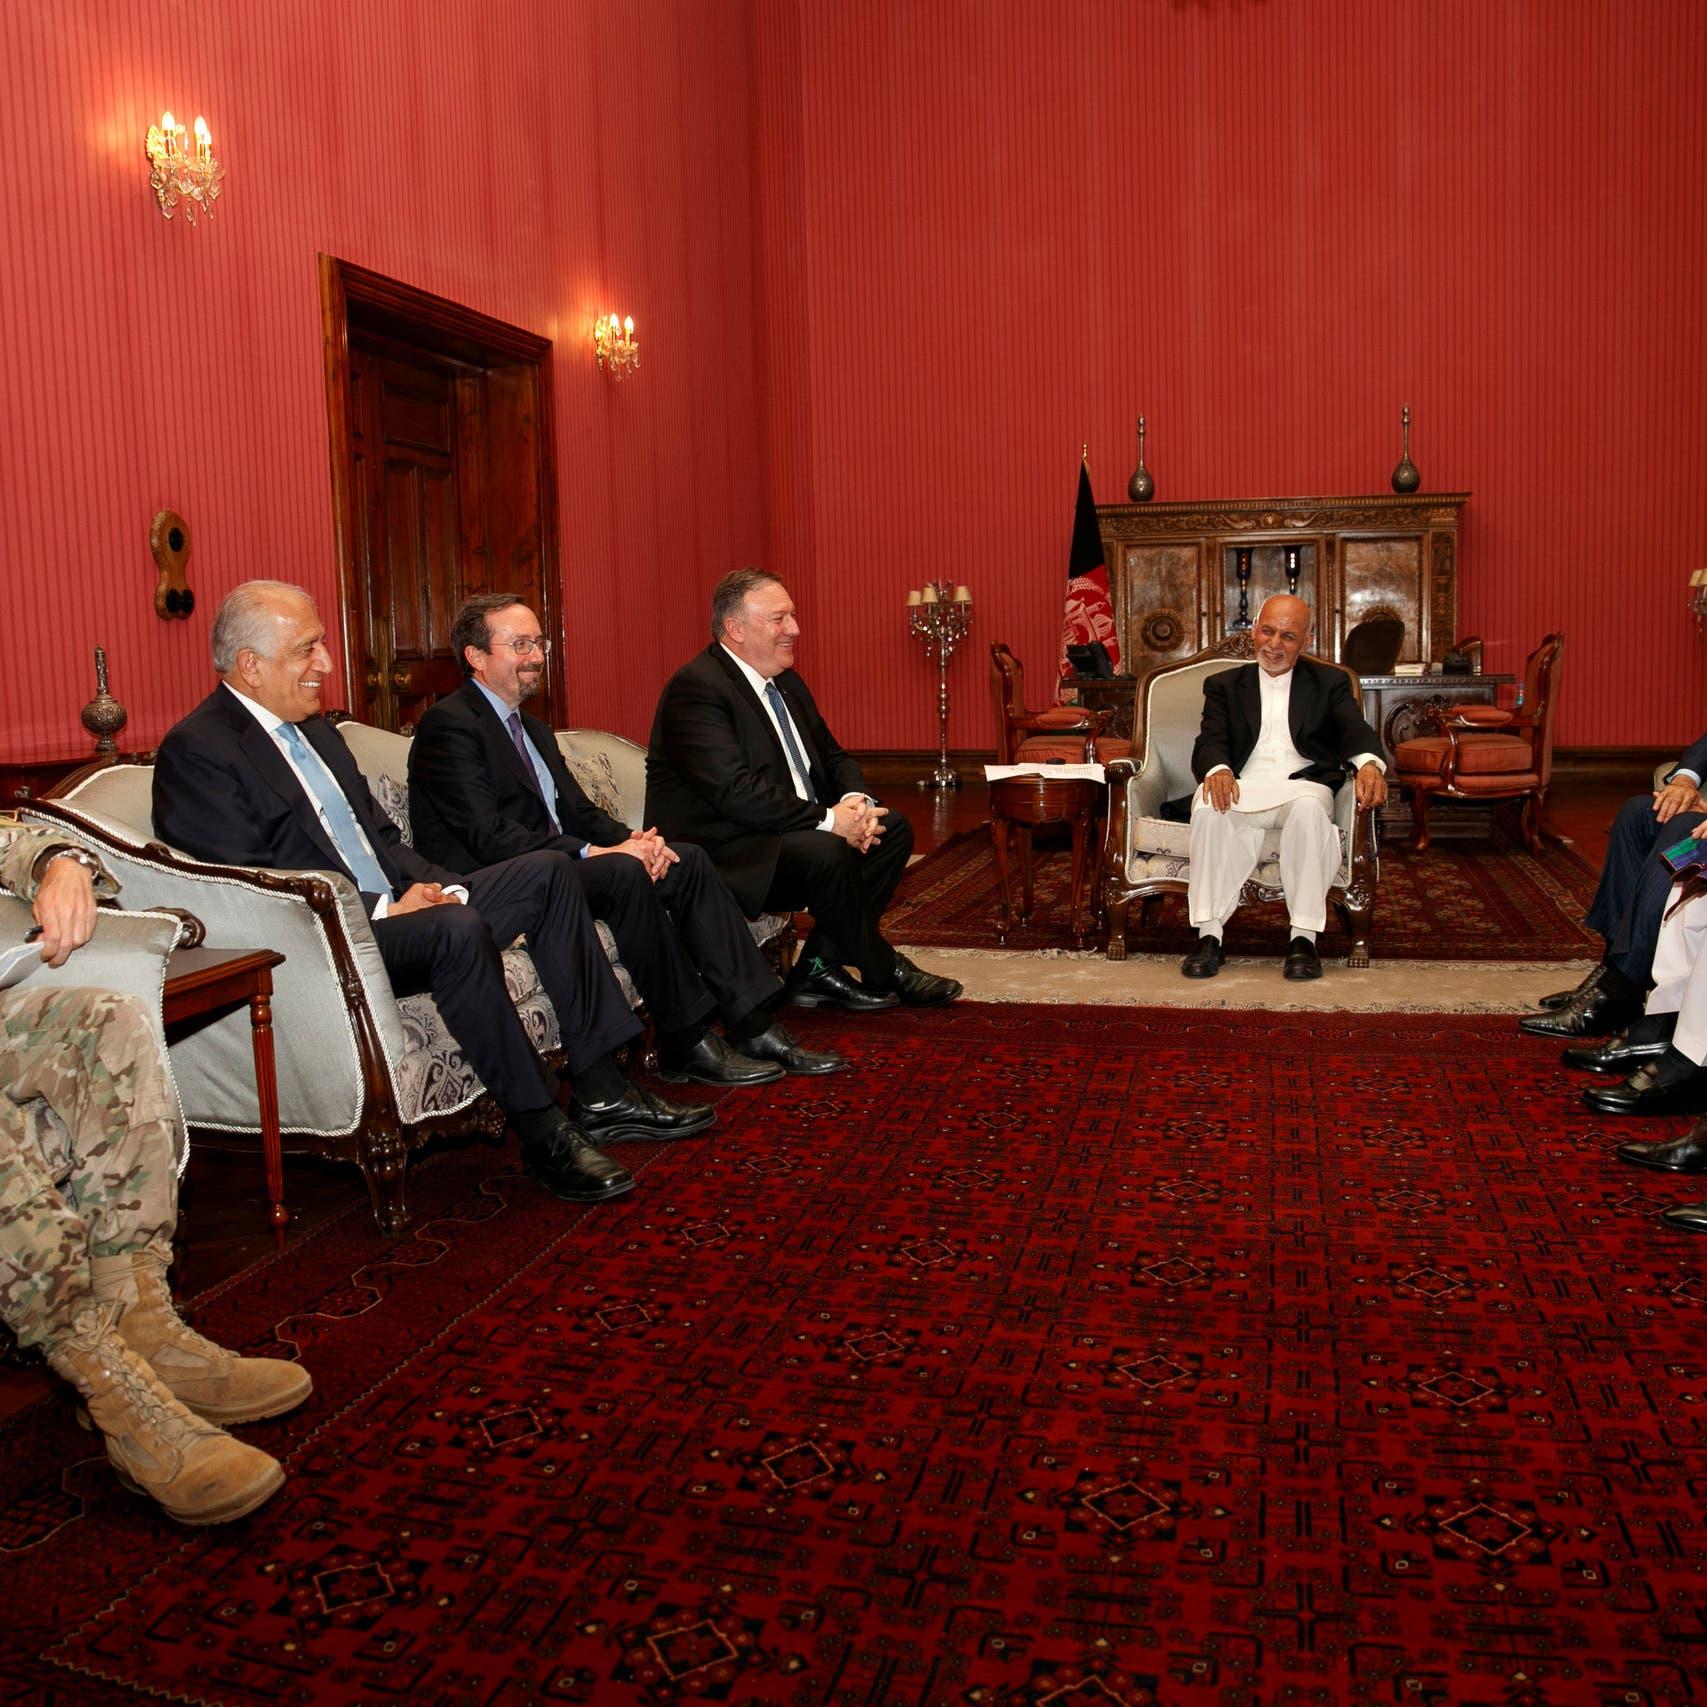 بومبيو من كابول: نأمل باتفاق سلام قبل سبتمبر